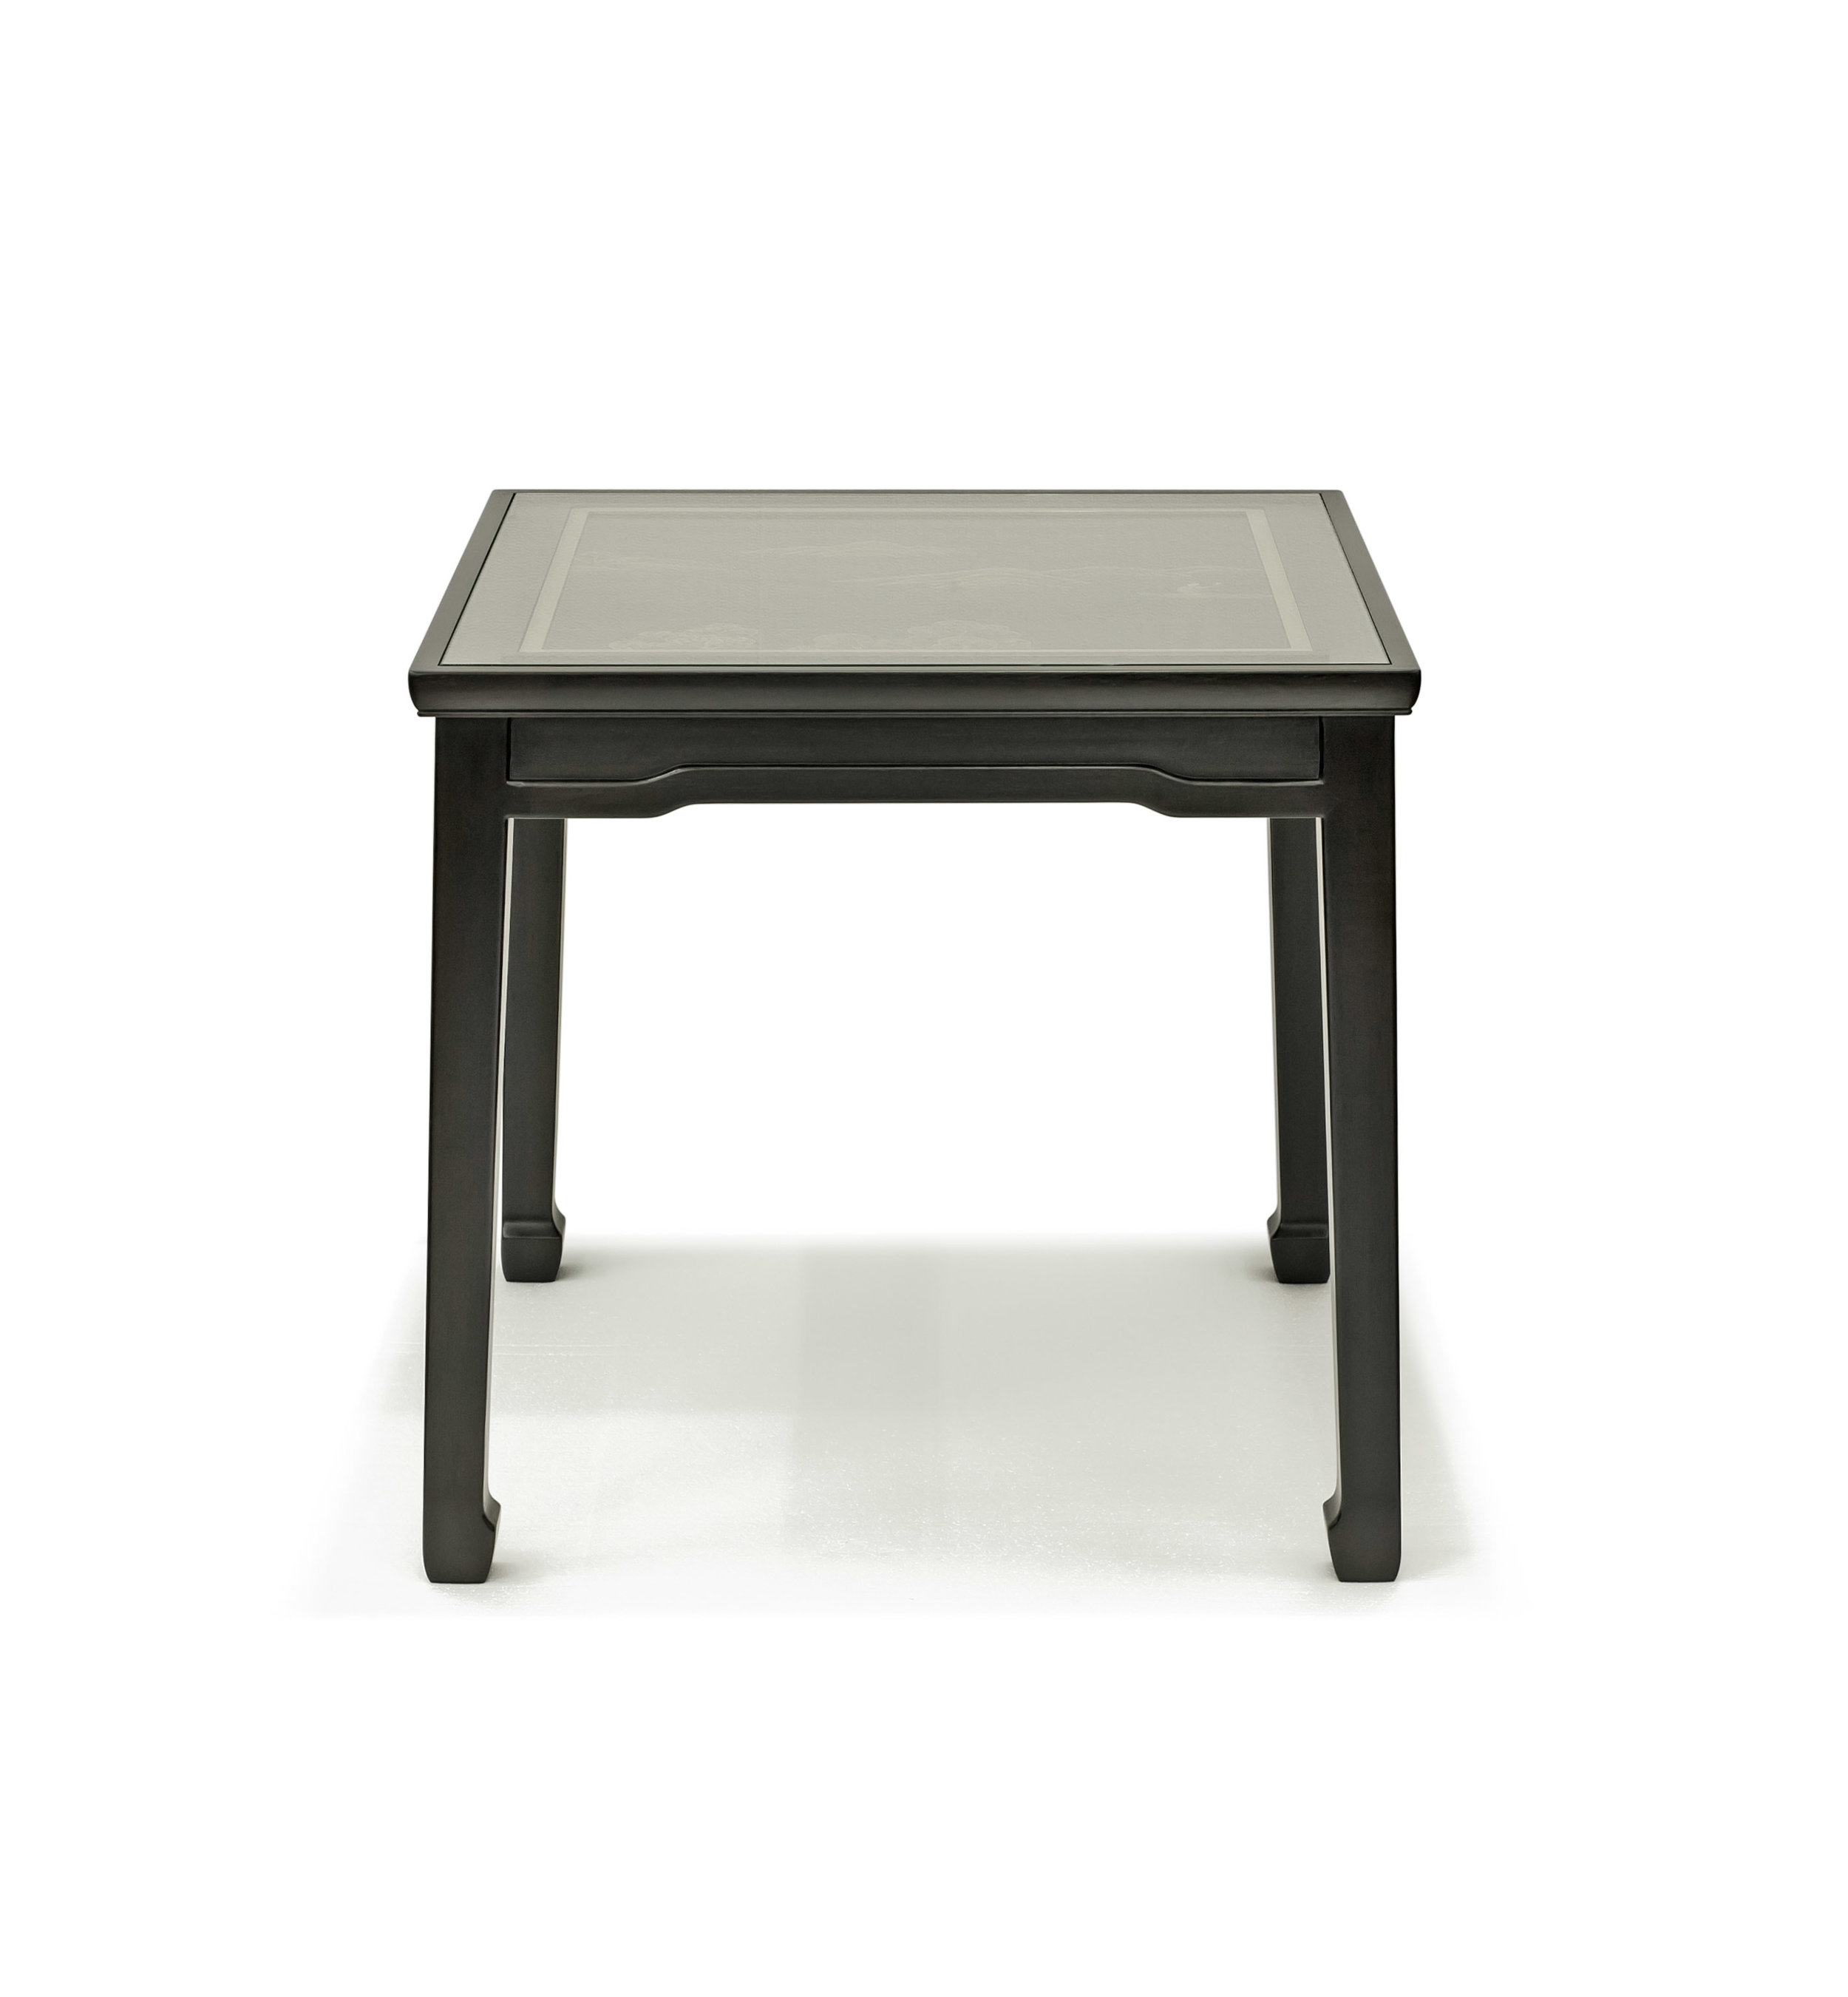 ....bespoke chinese ming style furniture   rosewood london : tea table..特别定制中式明式家具   瑰丽伦敦酒店:茶台....